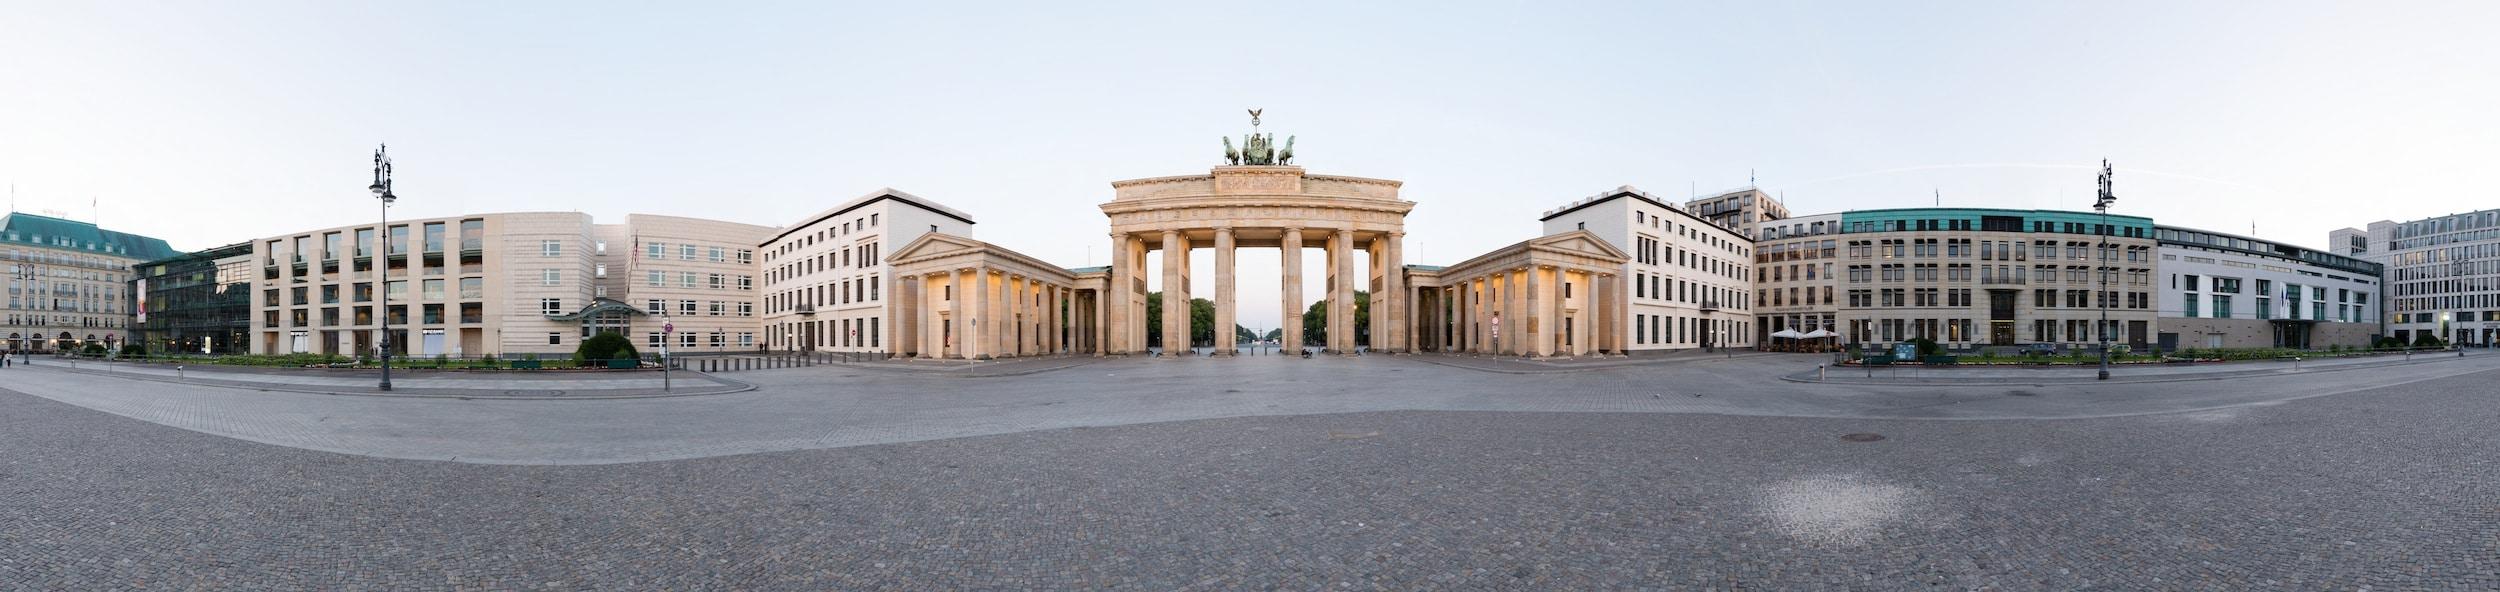 Panorama Berlin Brandenburger Tor (180 Grad), (Foto copyright - Frank Weber - Berlin - www.fotologbuch.de)